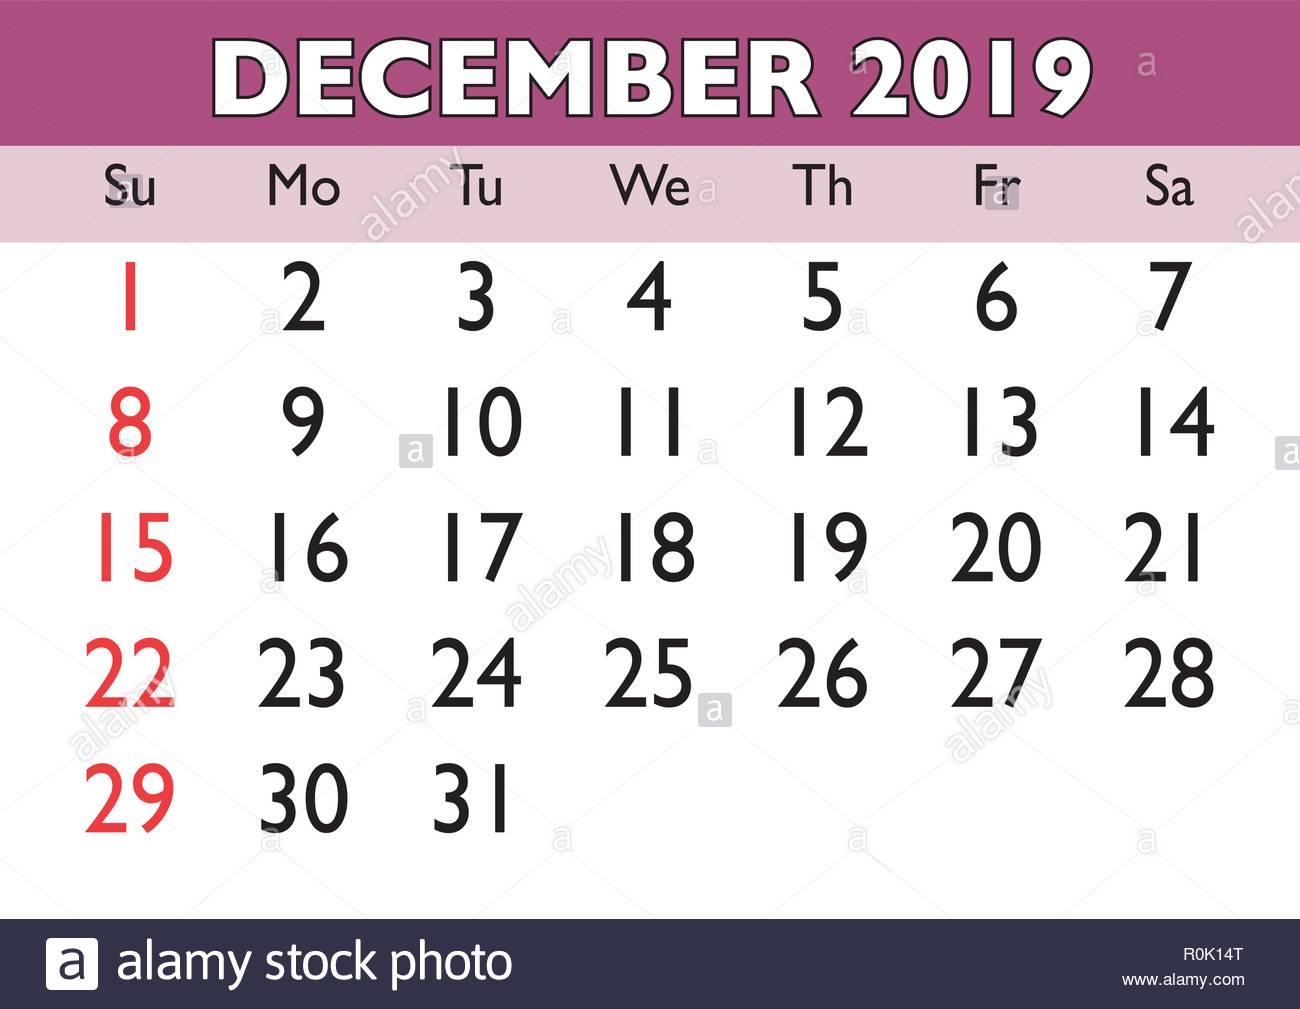 Calendrier Mensuel Decembre 2019.Calendrier 2019 Mois Decembre Vector Version Calendrier